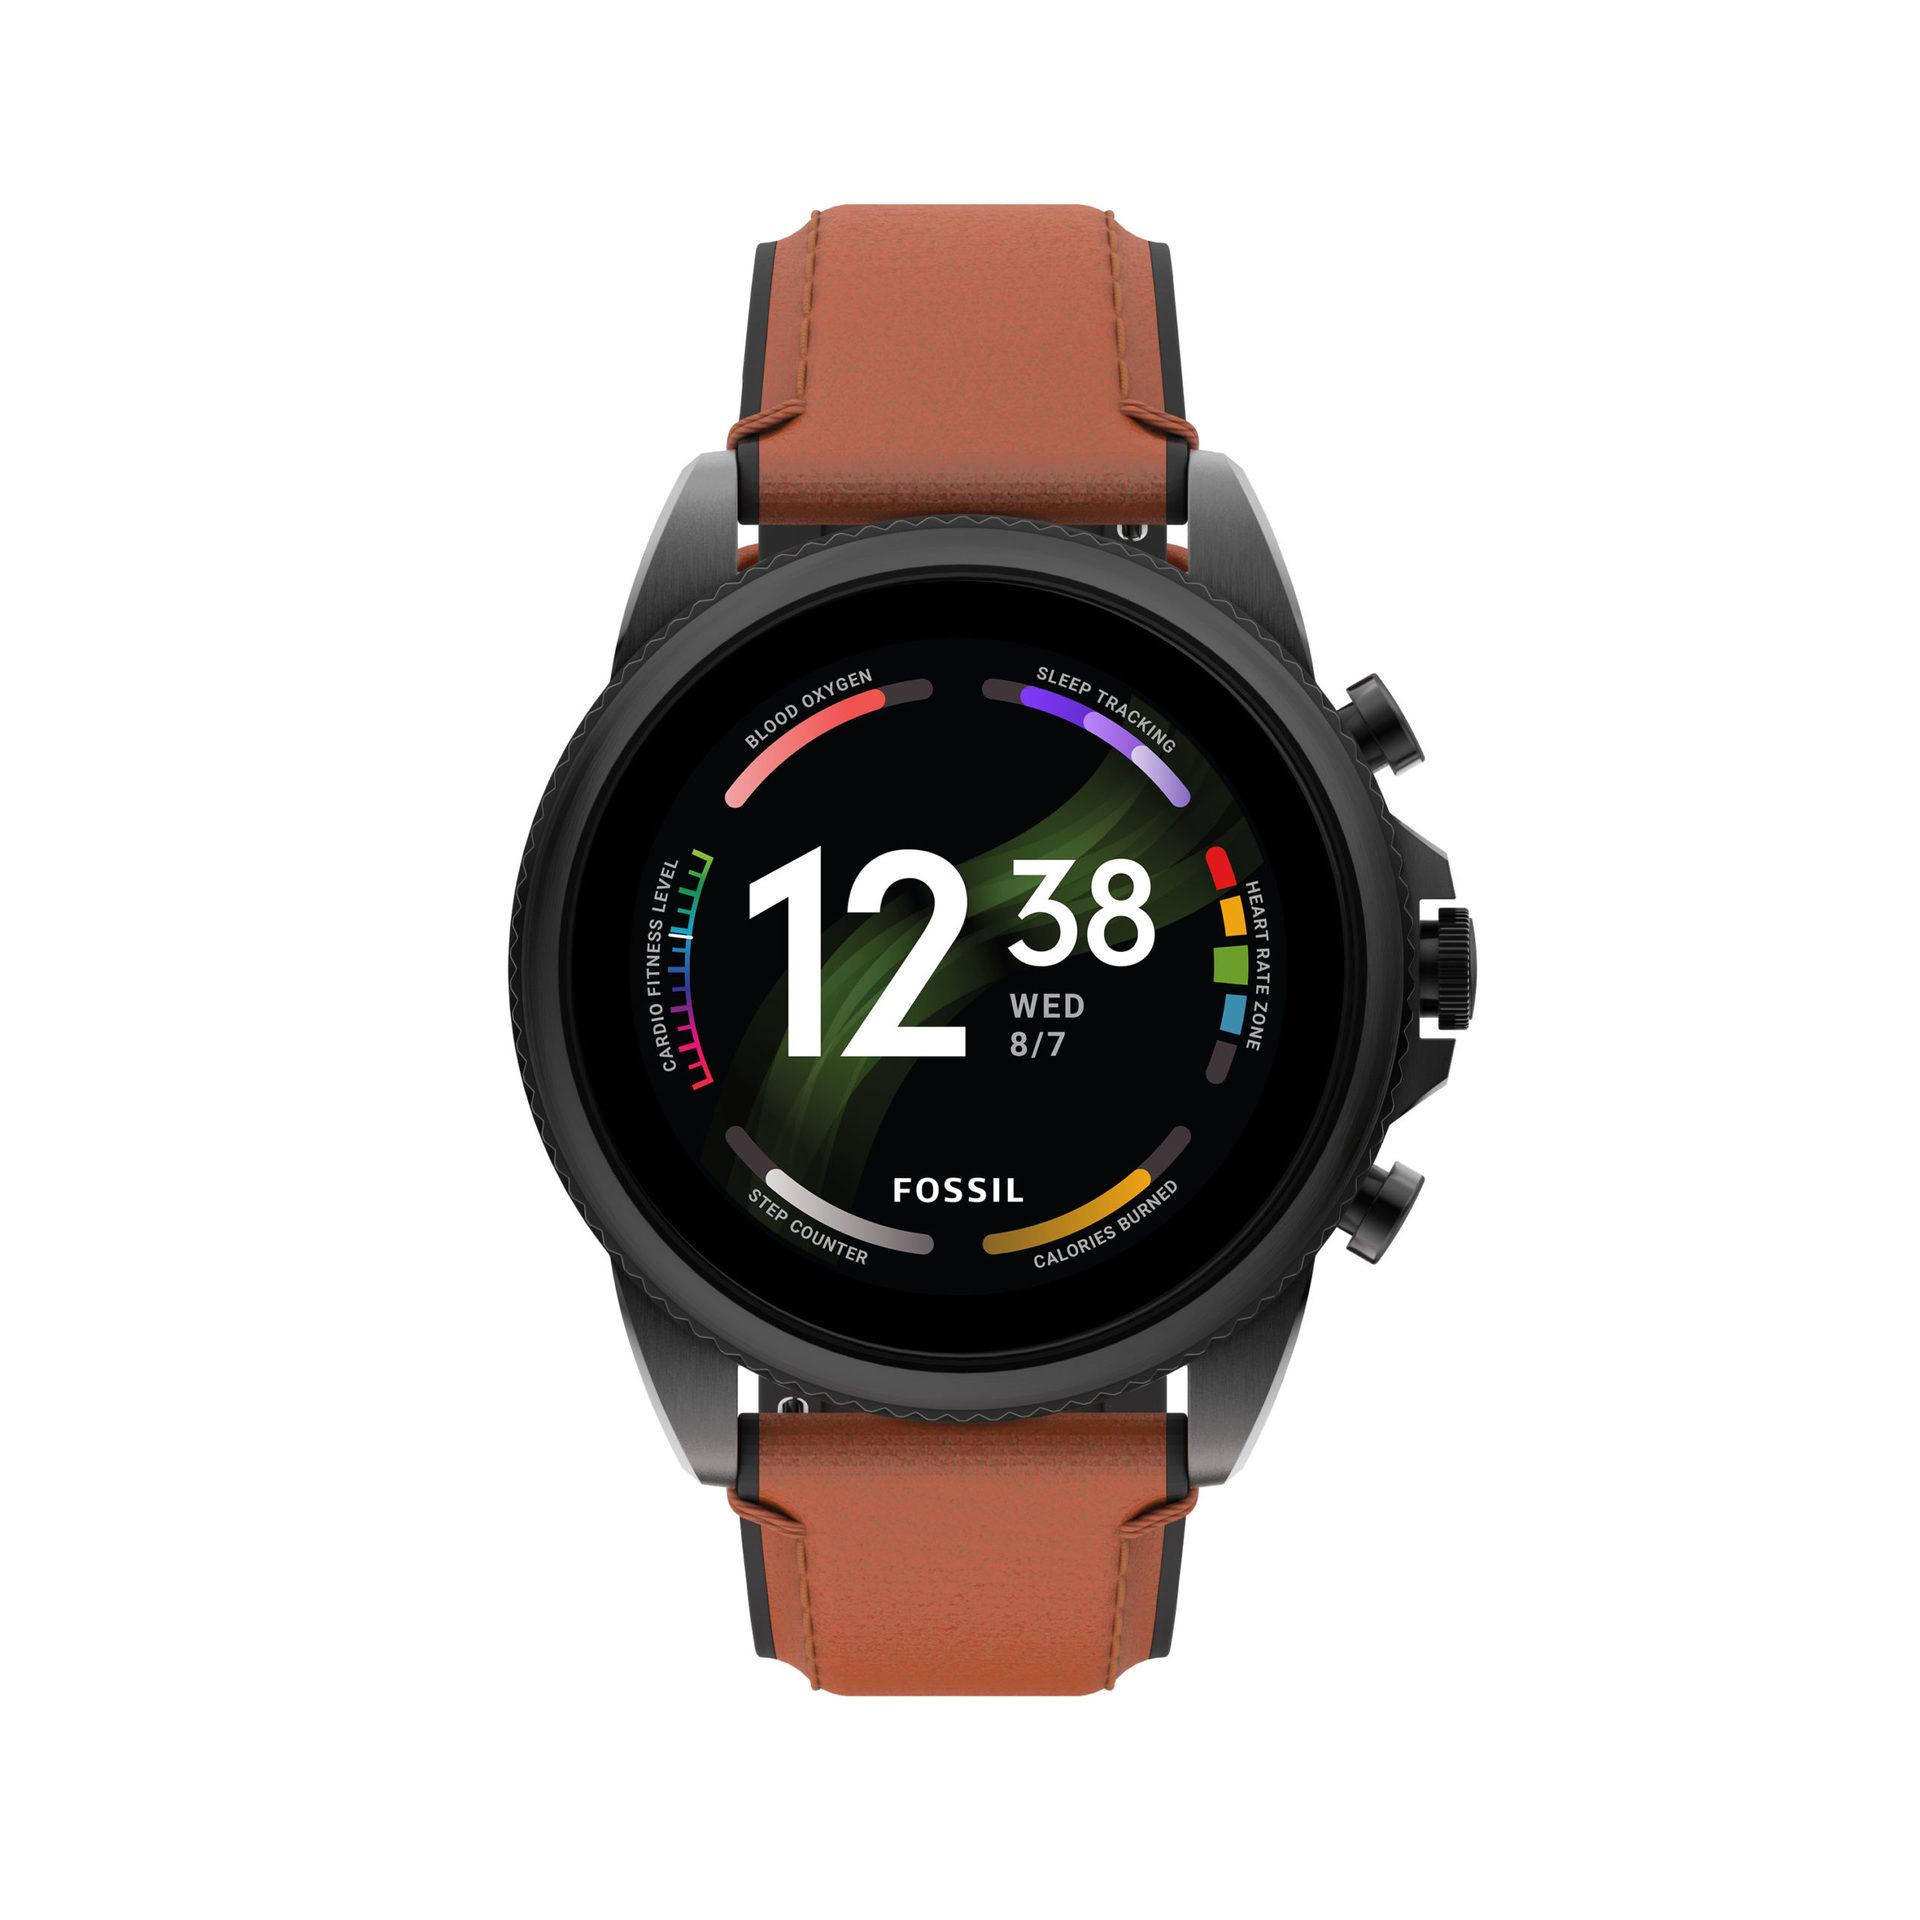 Fossil Gen 6 smartwatch